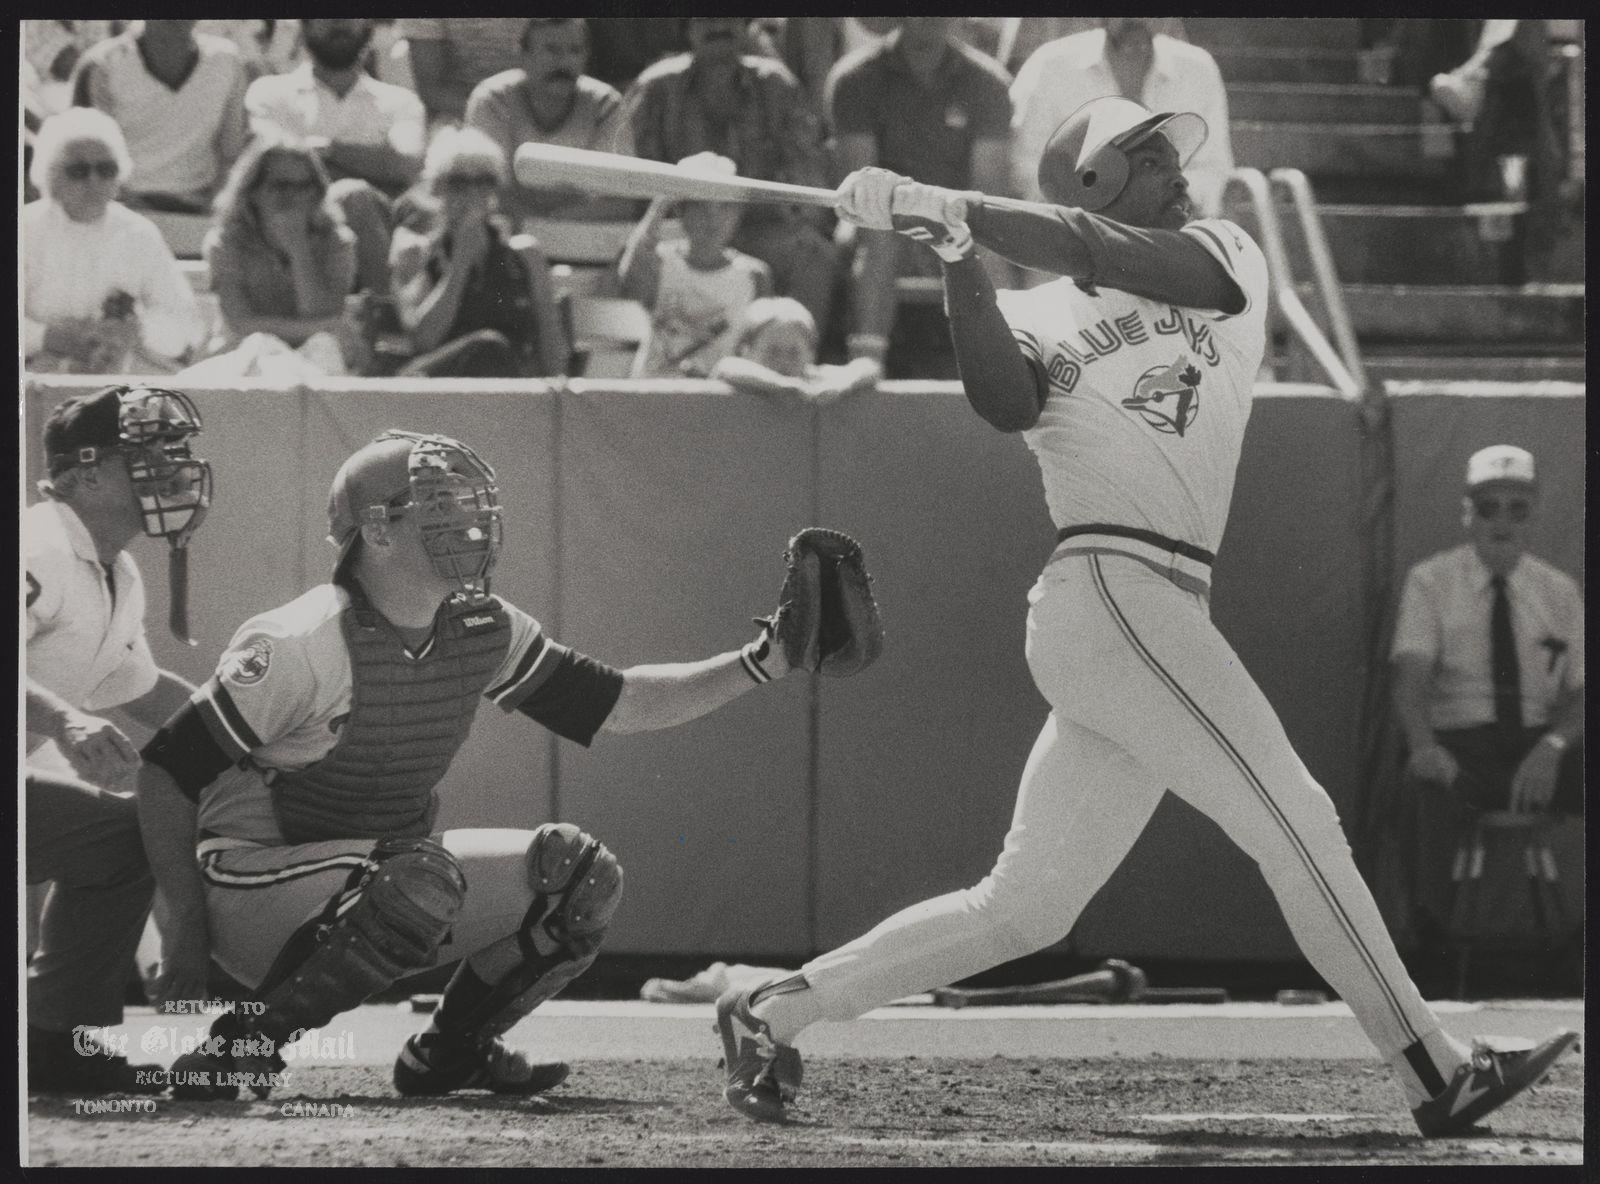 Lloyd MOSEBY Baseball Player Umpire Rich Garcia and Twin catcher Tim Laudner watch as Blue Jays' Lloyd Moseby strokes a third-inning grand slam.